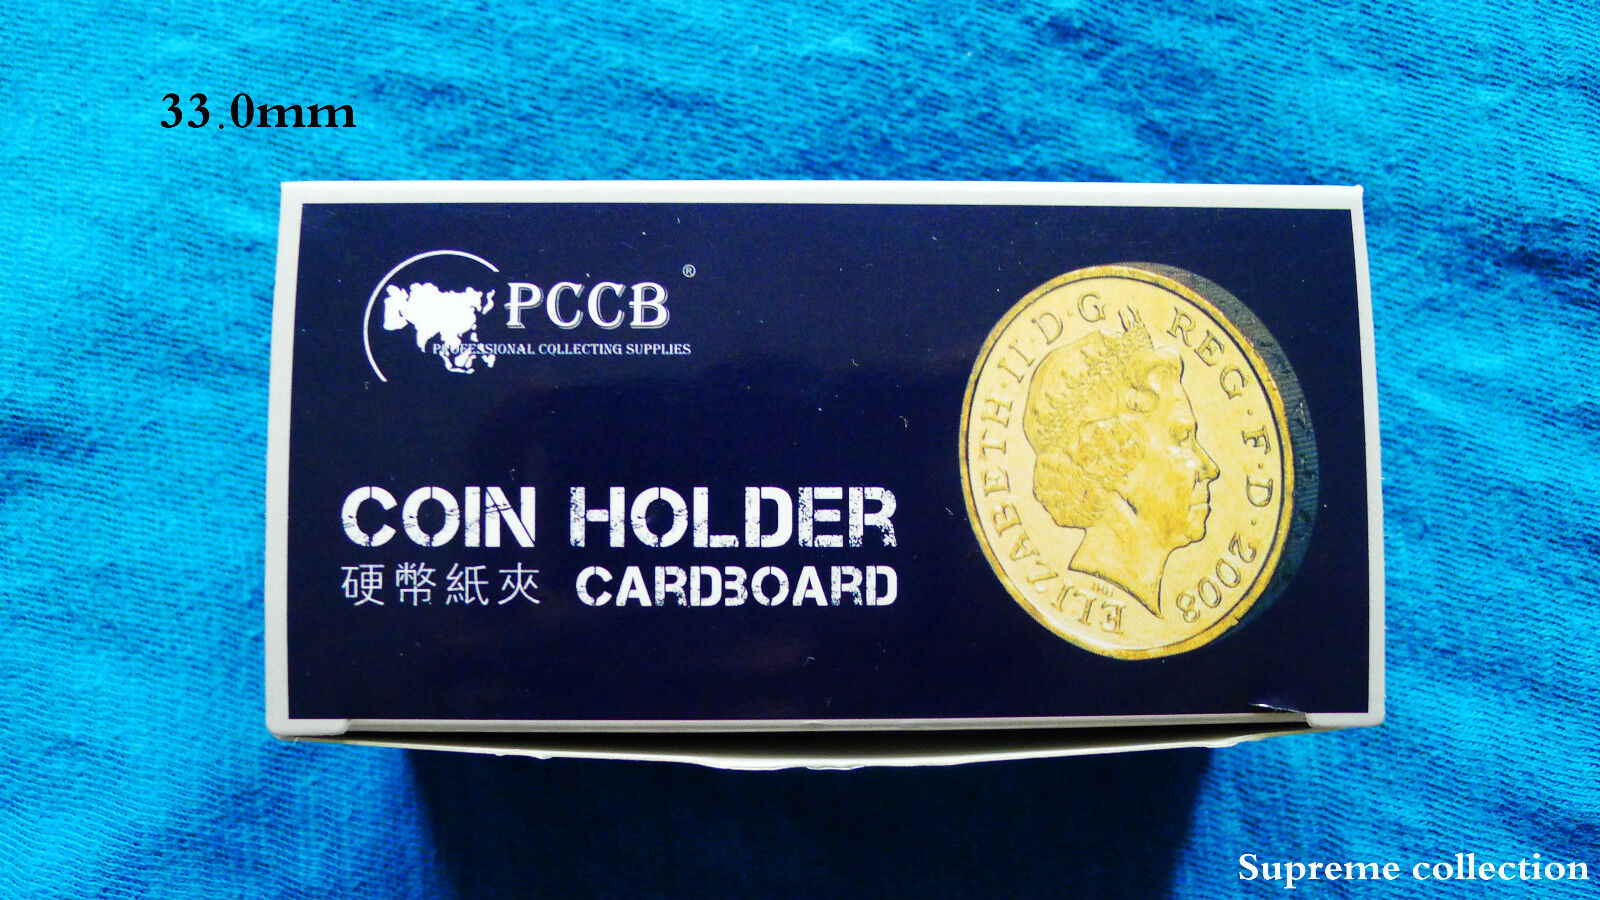 100 pcs Coin Holders 2 X 2 Cardboard Mylar Flips  Diameter 33mm New